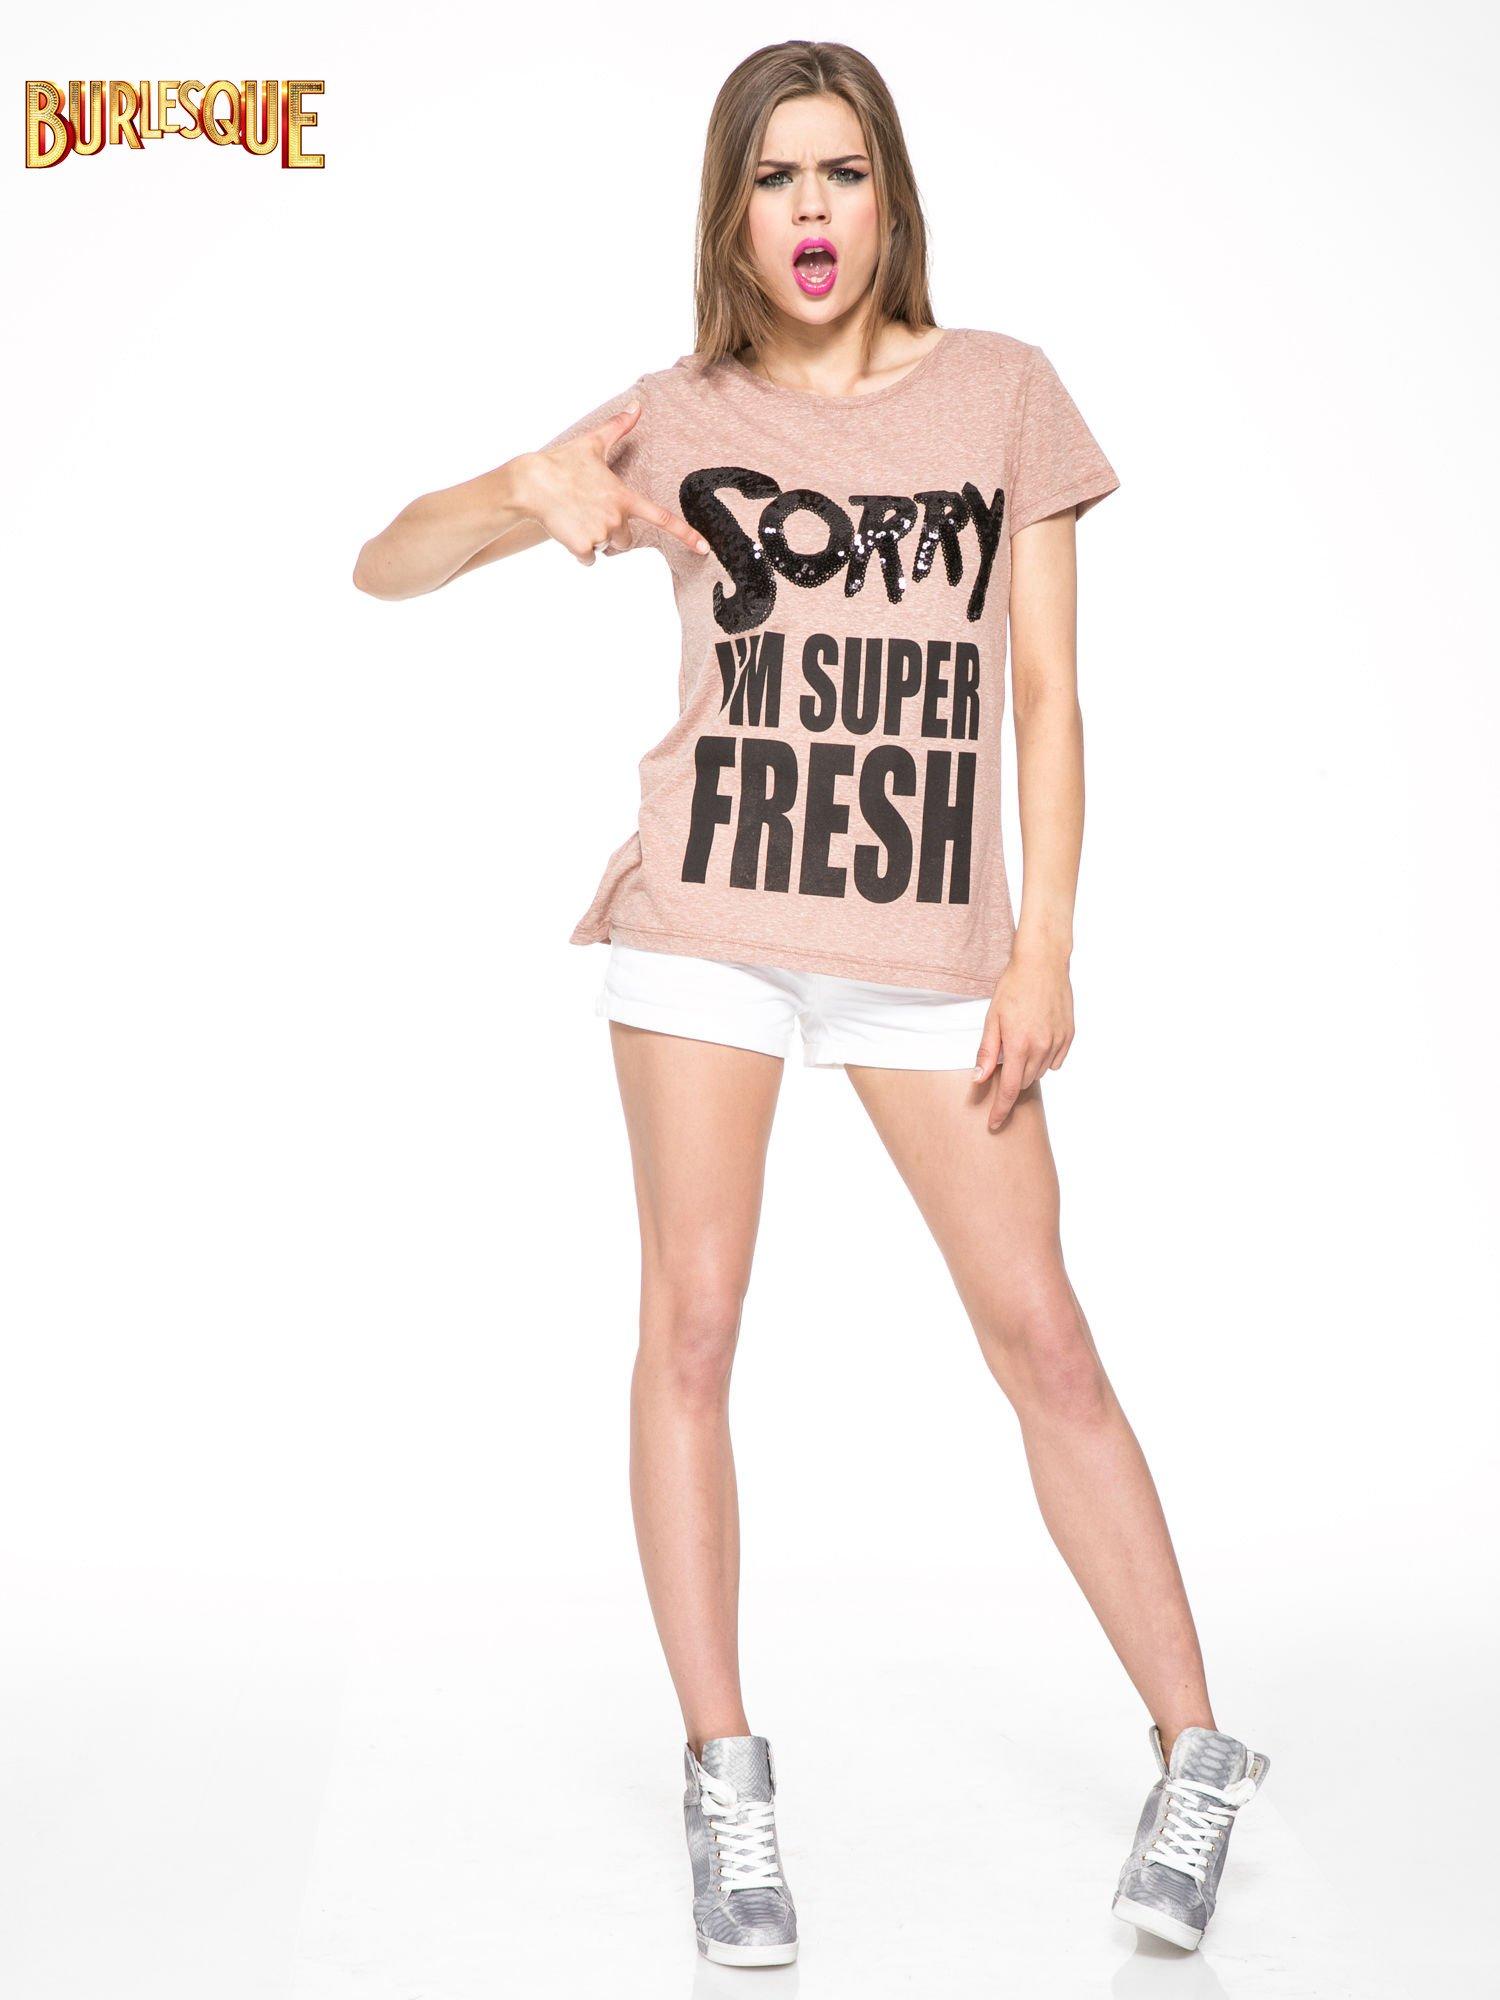 Jasnoborodowy t-shirt z napisem SORRY I'M SUPER FRESH z dżetami                                  zdj.                                  2